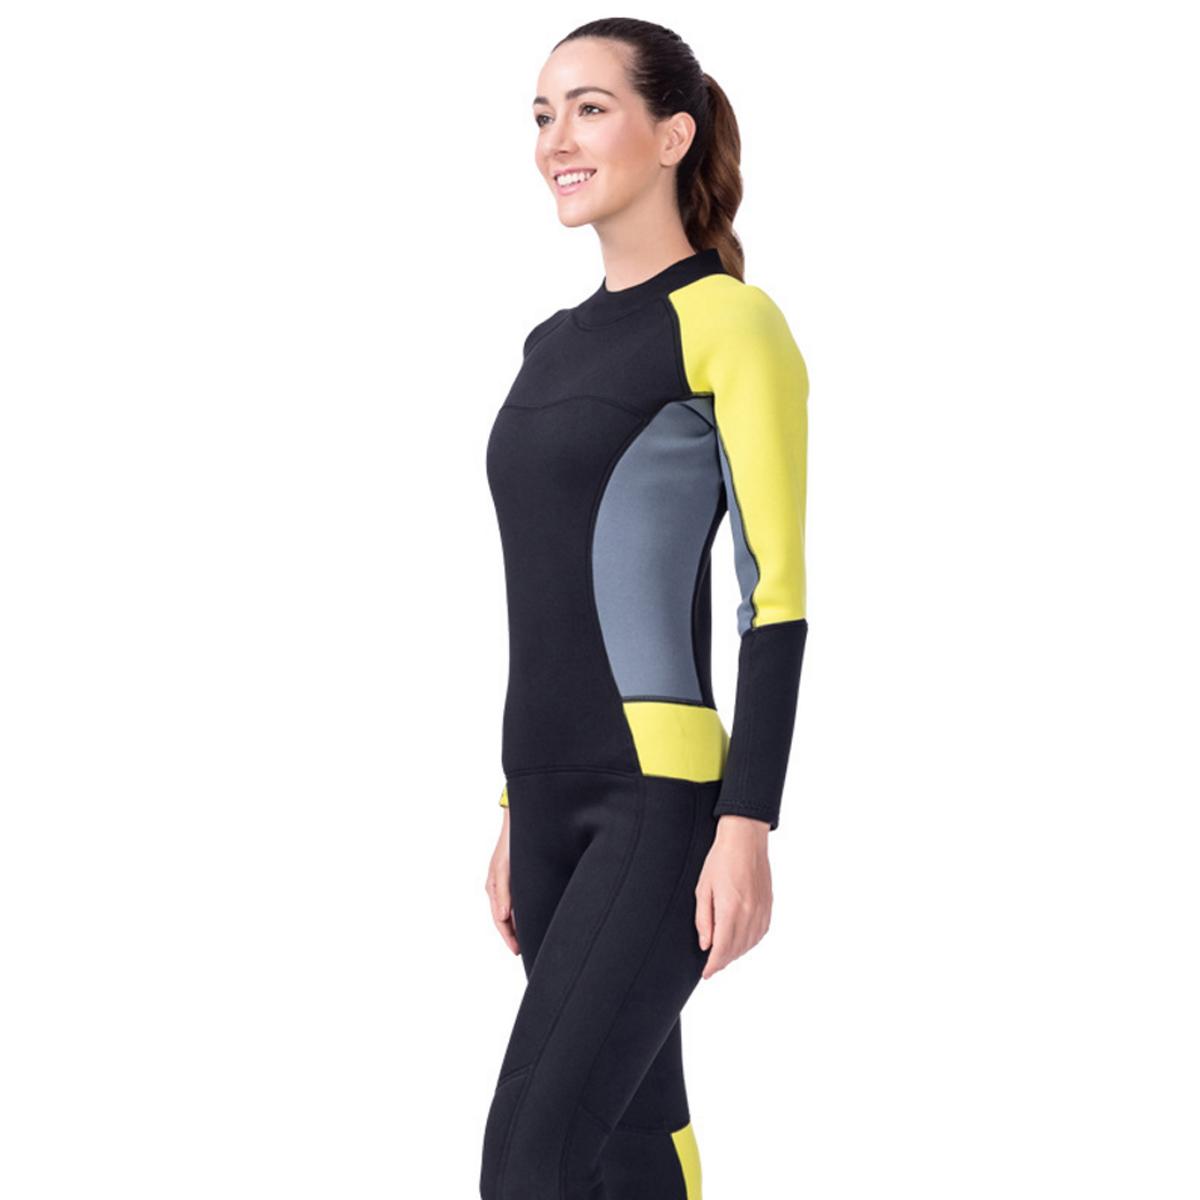 e9f46efcd8 Details about Women 3mm Neoprene Long Wetsuit One-piece Swimsuit Swimwear  Surfing Diving Suit